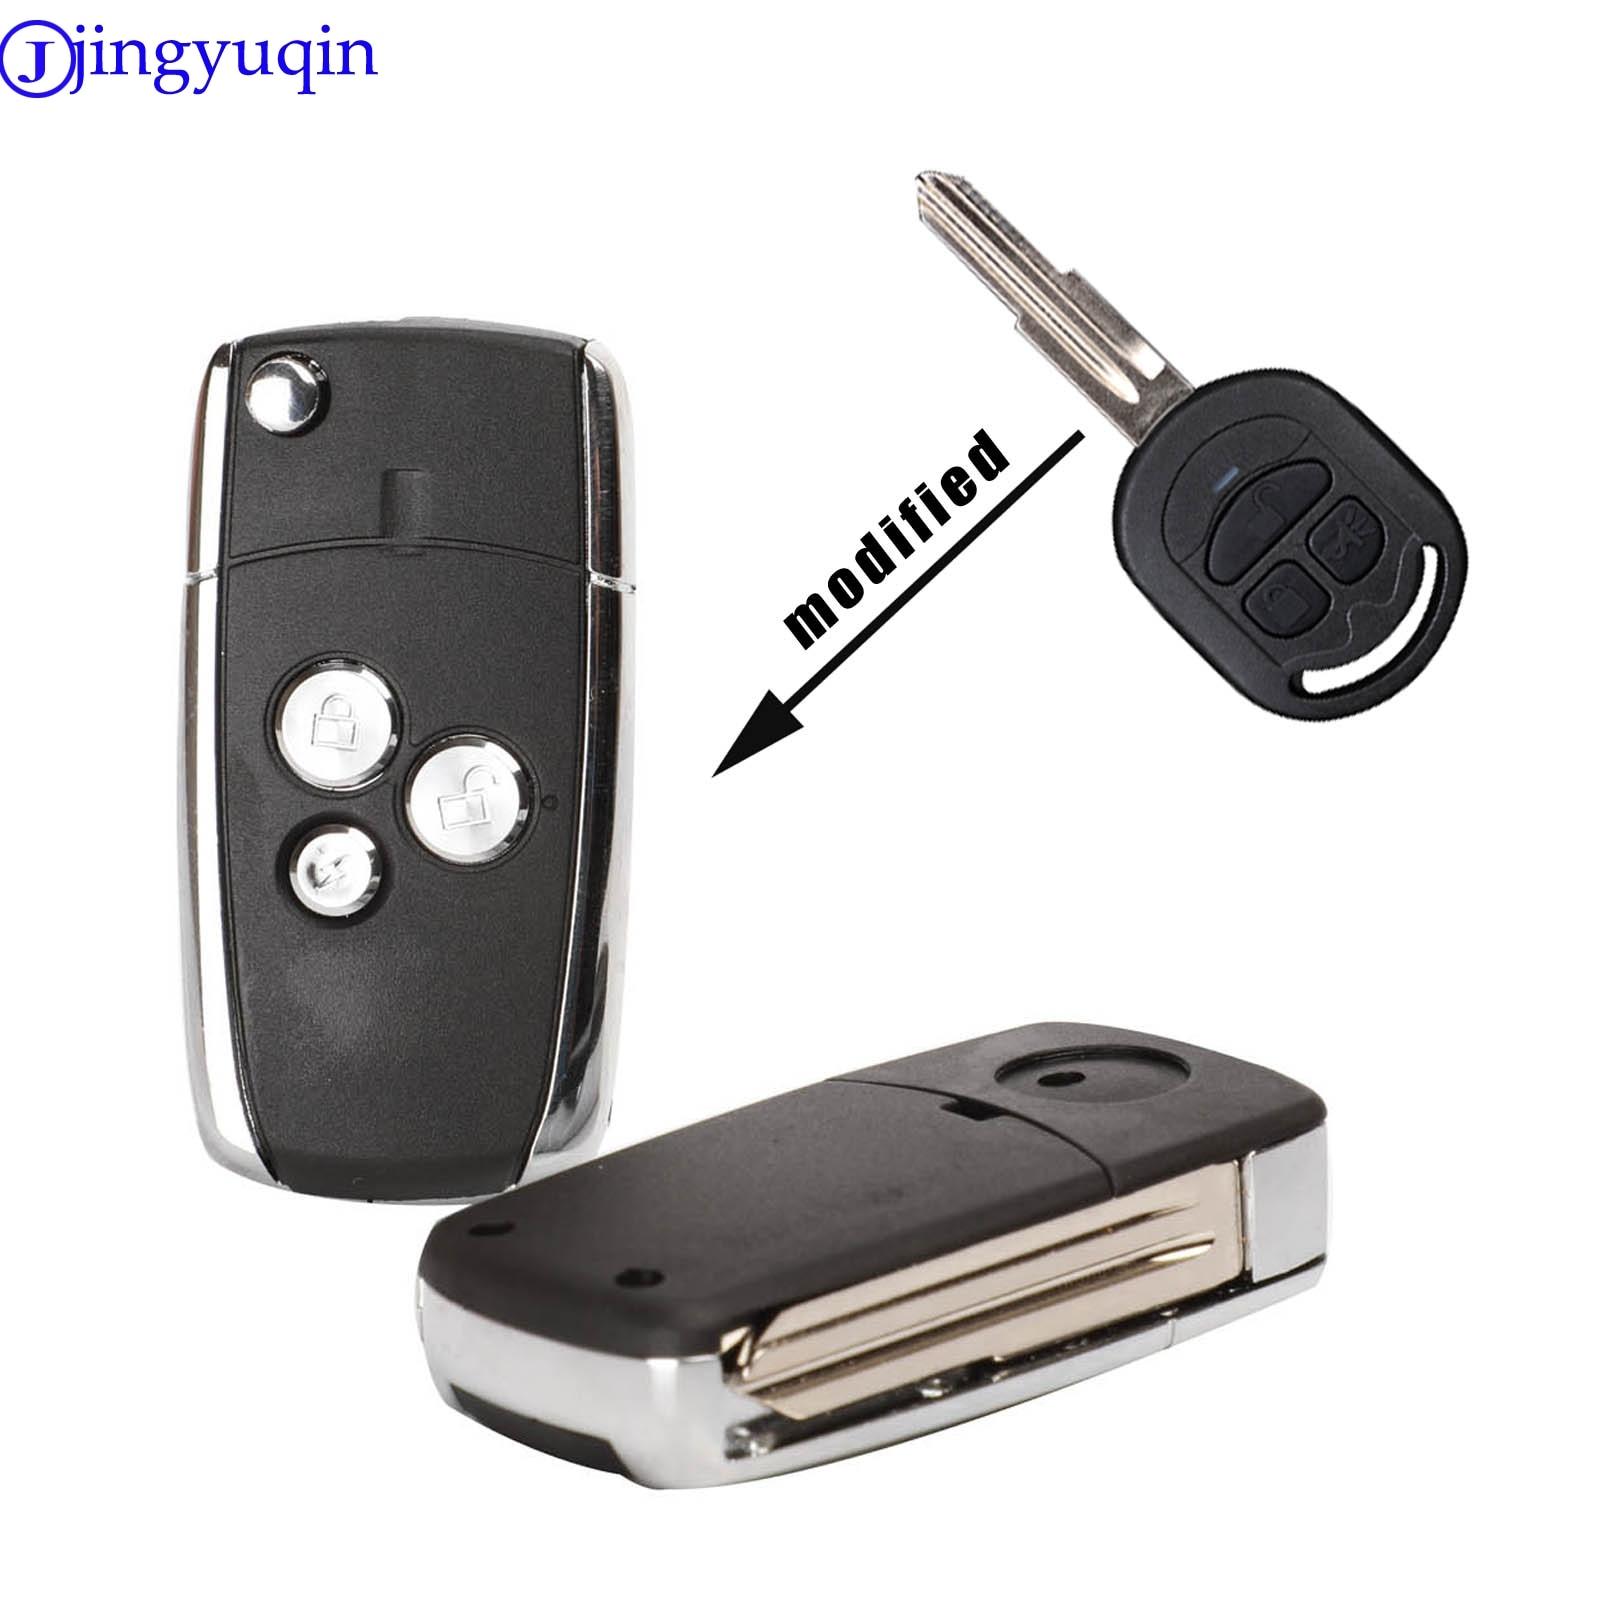 Nueva modificación de jingyuqin, carcasa plegable con 3 botones, mando a distancia, clave sin grabar, carcasa para llave de coche apta para Buick Excelle clave HRV Shell